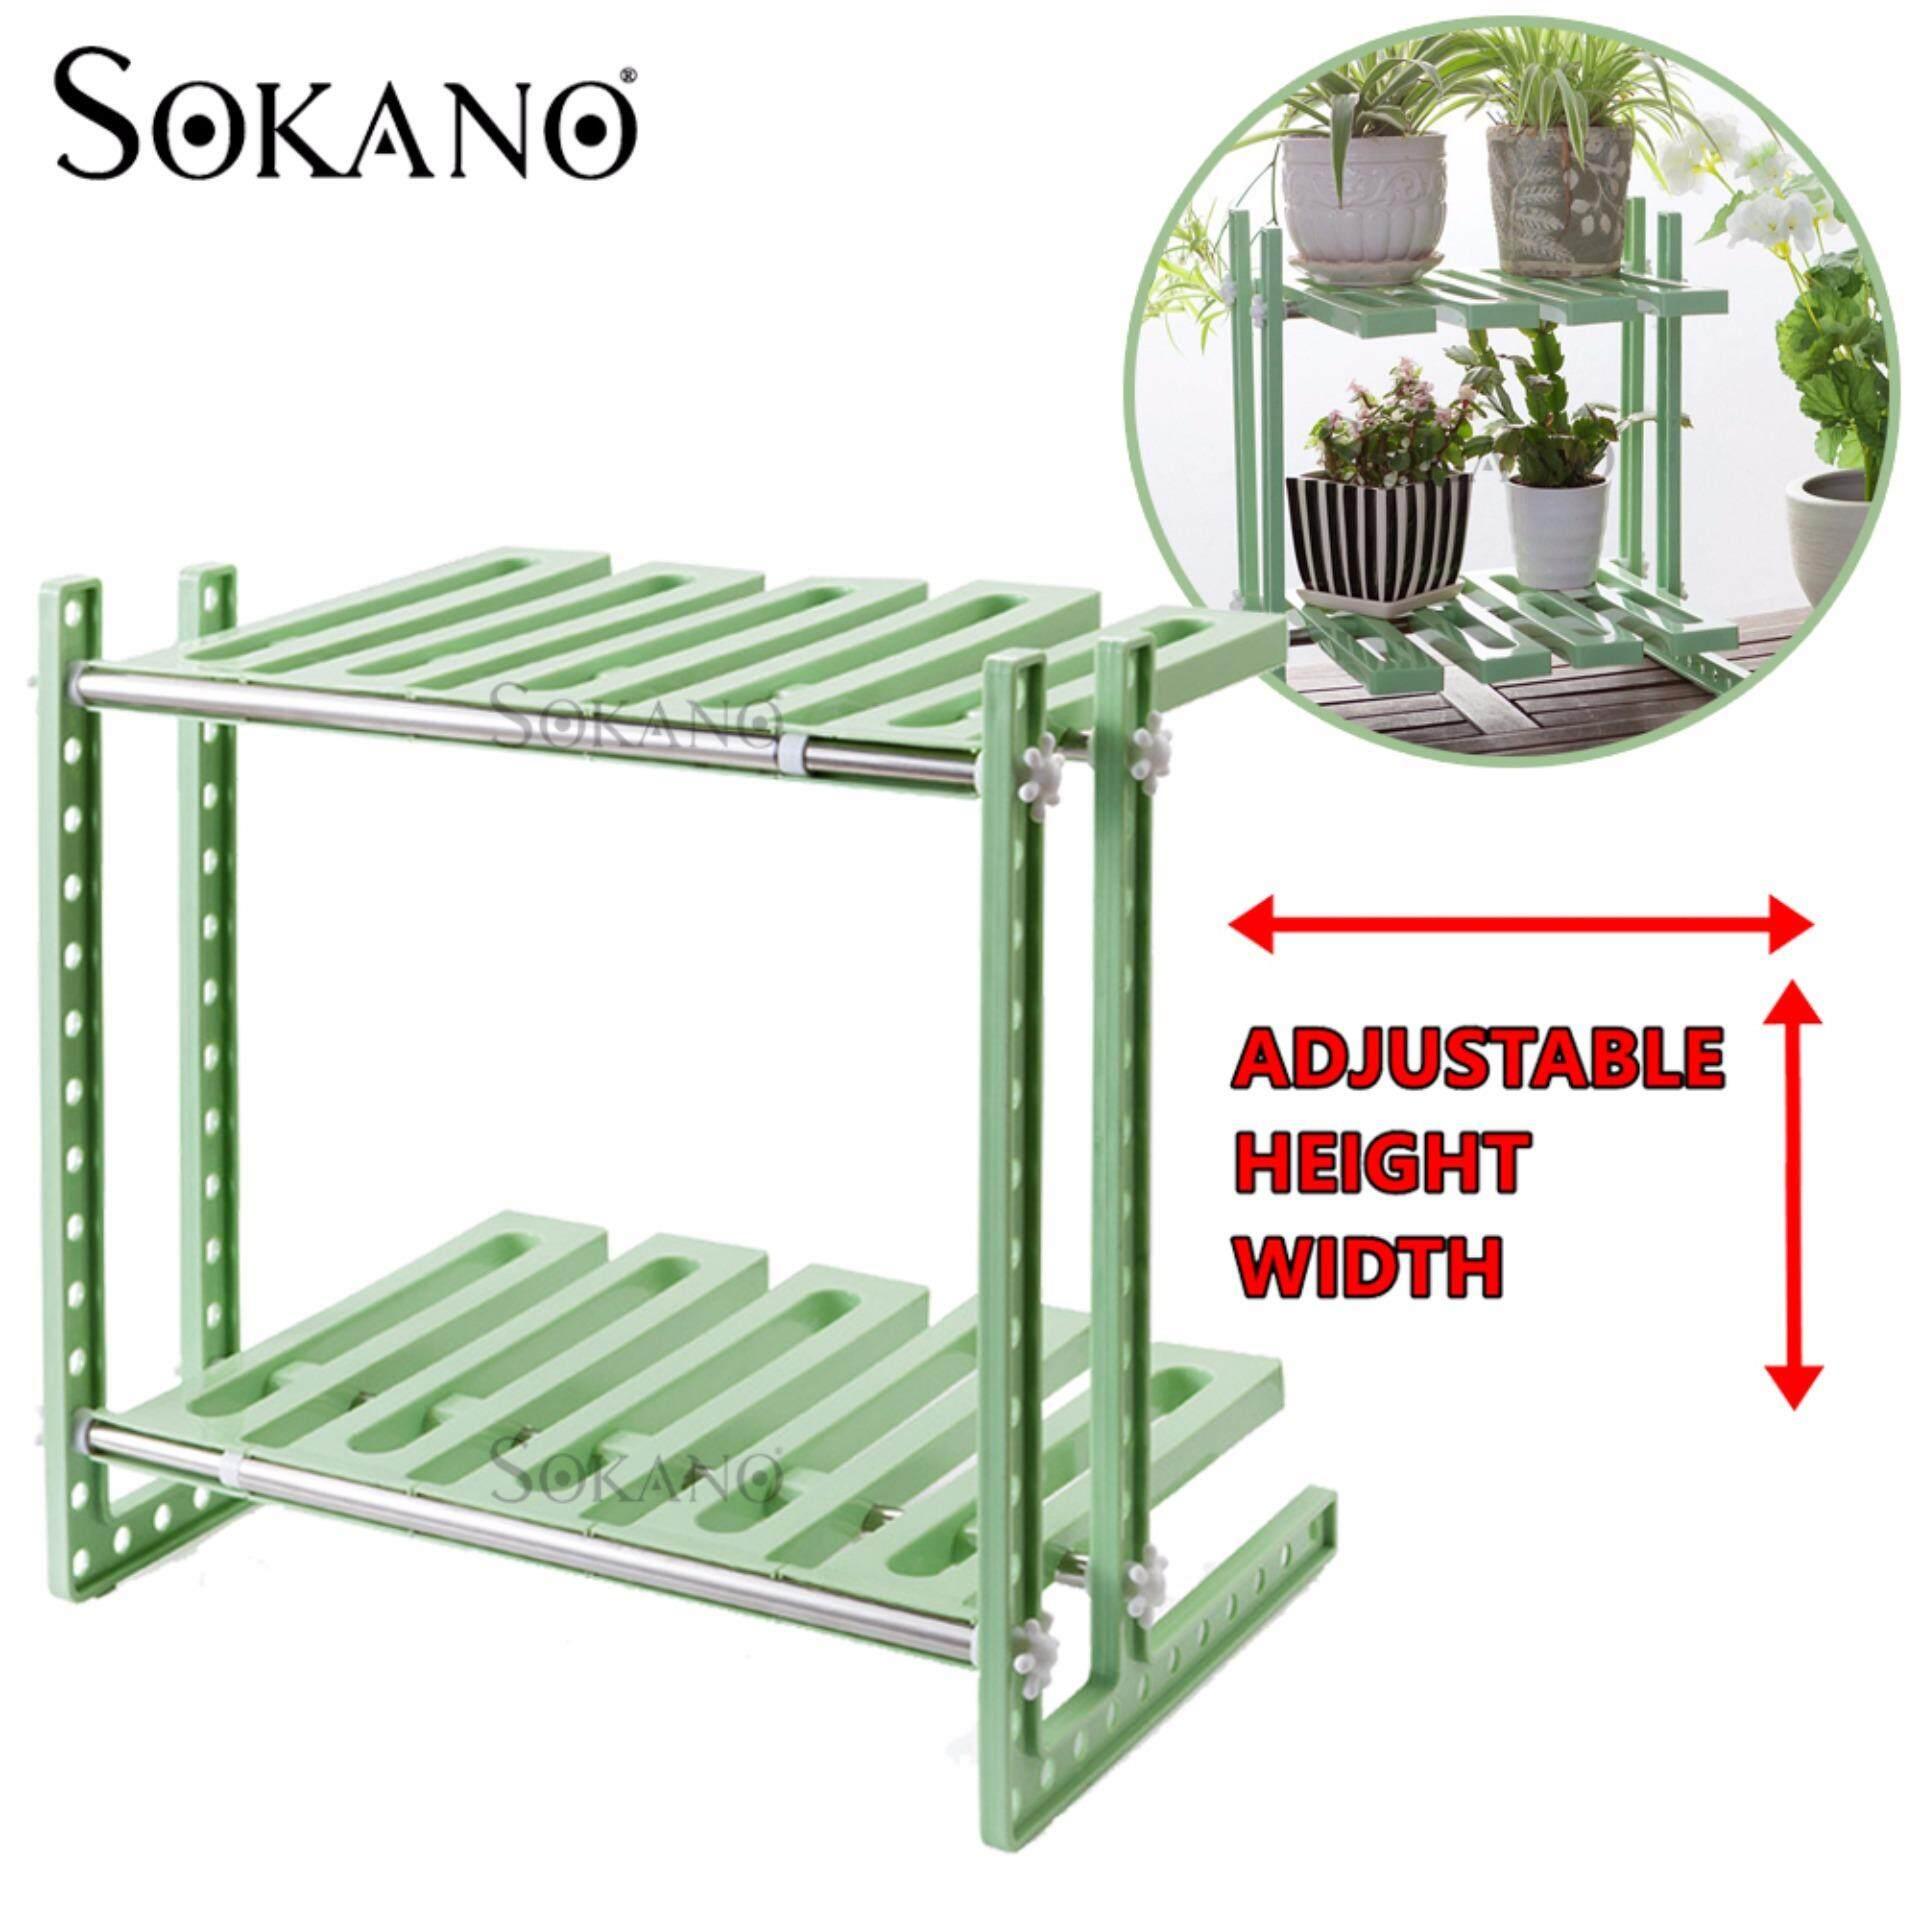 SOKANO New Generation Under Sink Kitchen Dapur Storage Mulitpurpose Organizer with Adjustable Length and Height - Green